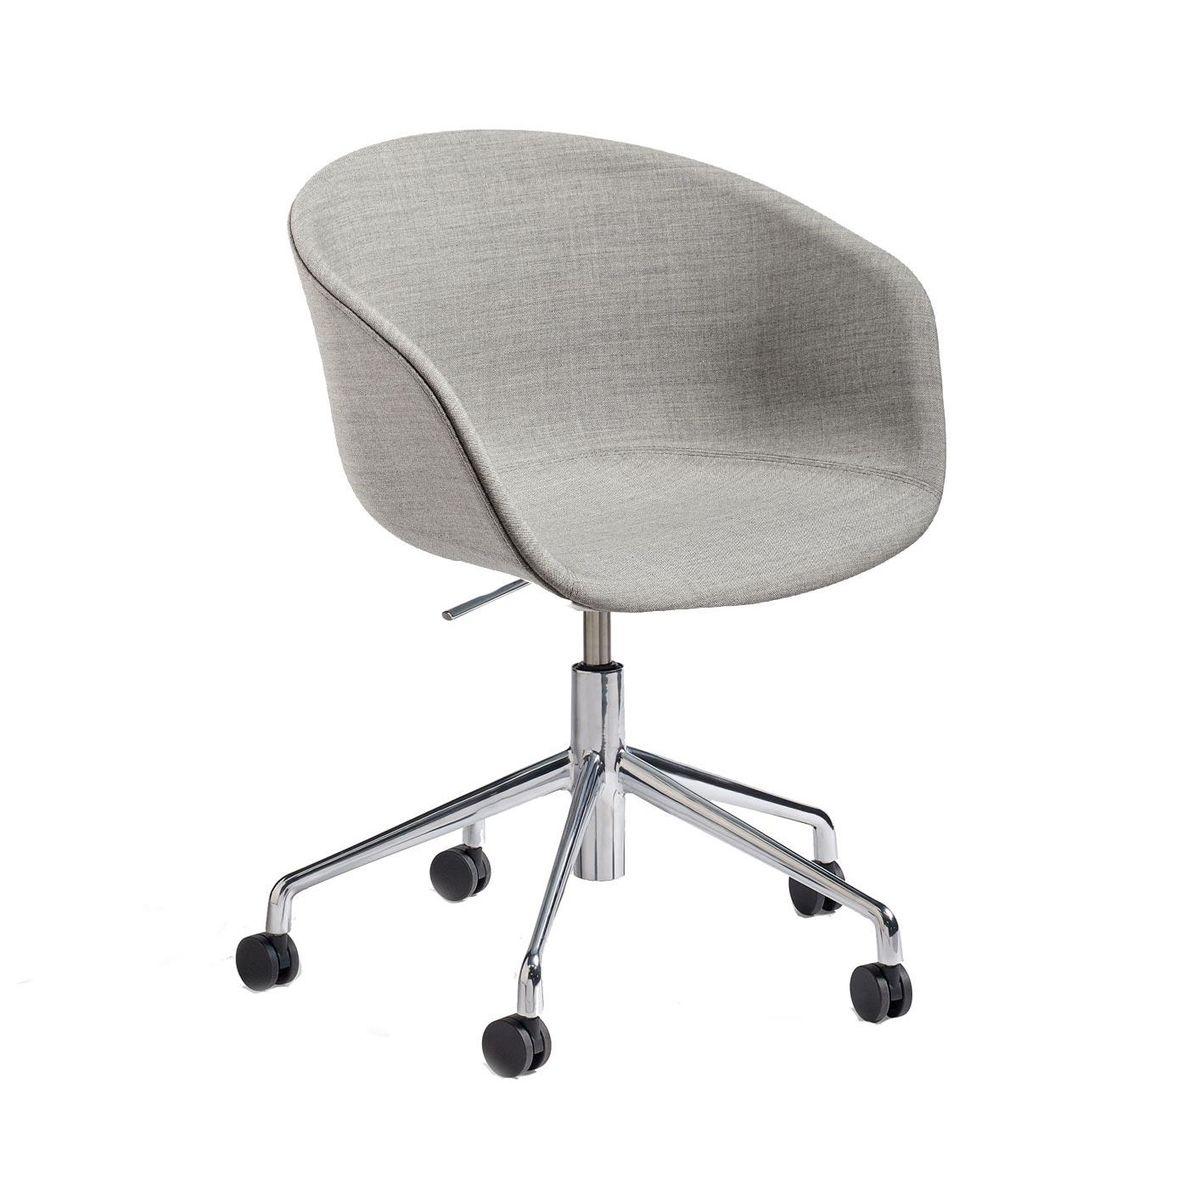 About a chair 53 armlehnstuhl h henverstellb hay for Armlehnstuhl grau stoff